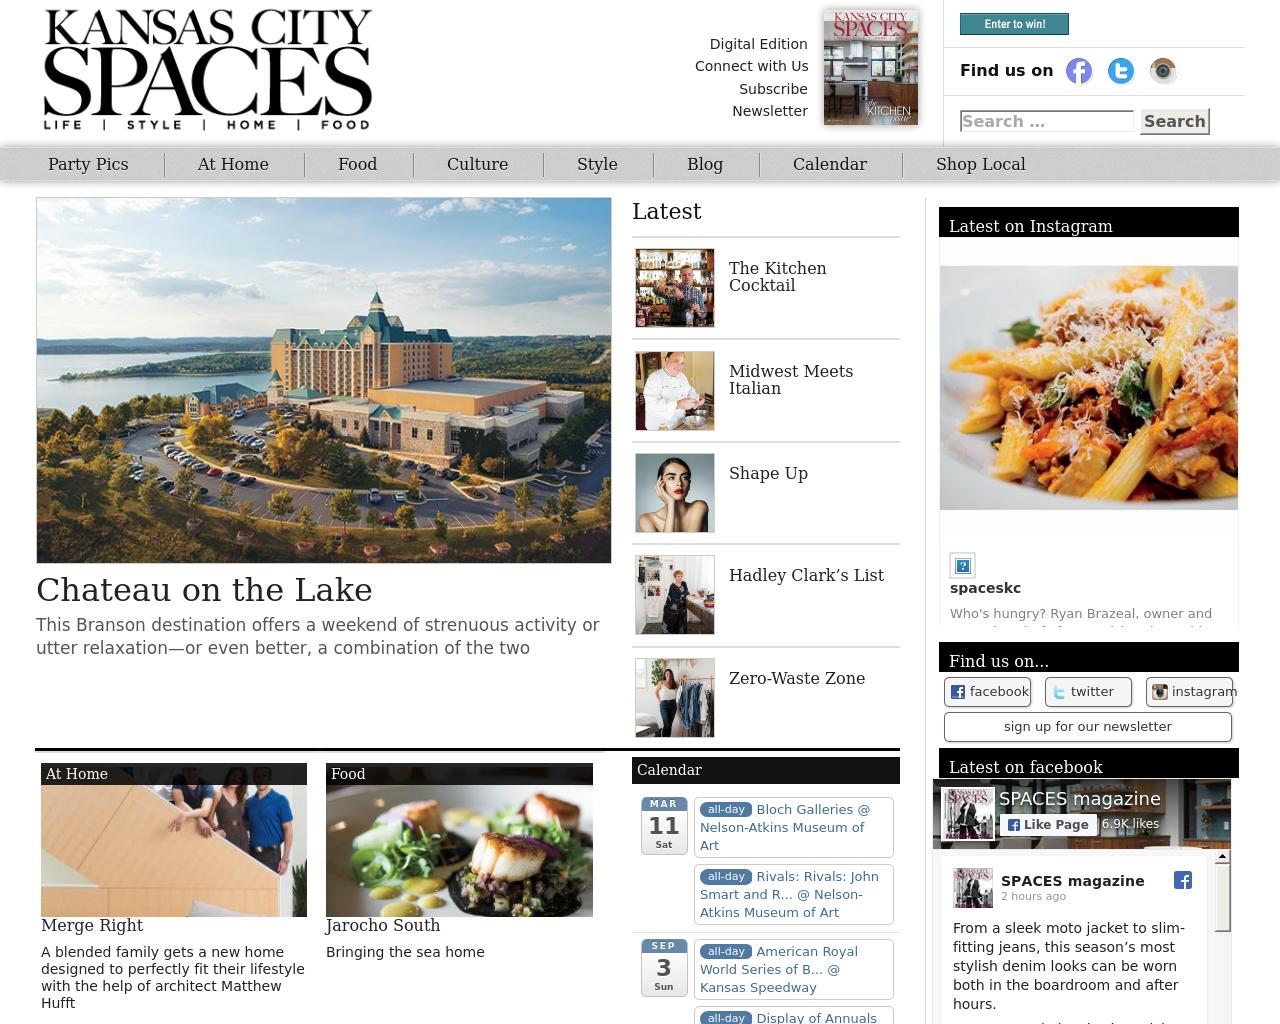 Kansas-City-Spaces-Advertising-Reviews-Pricing